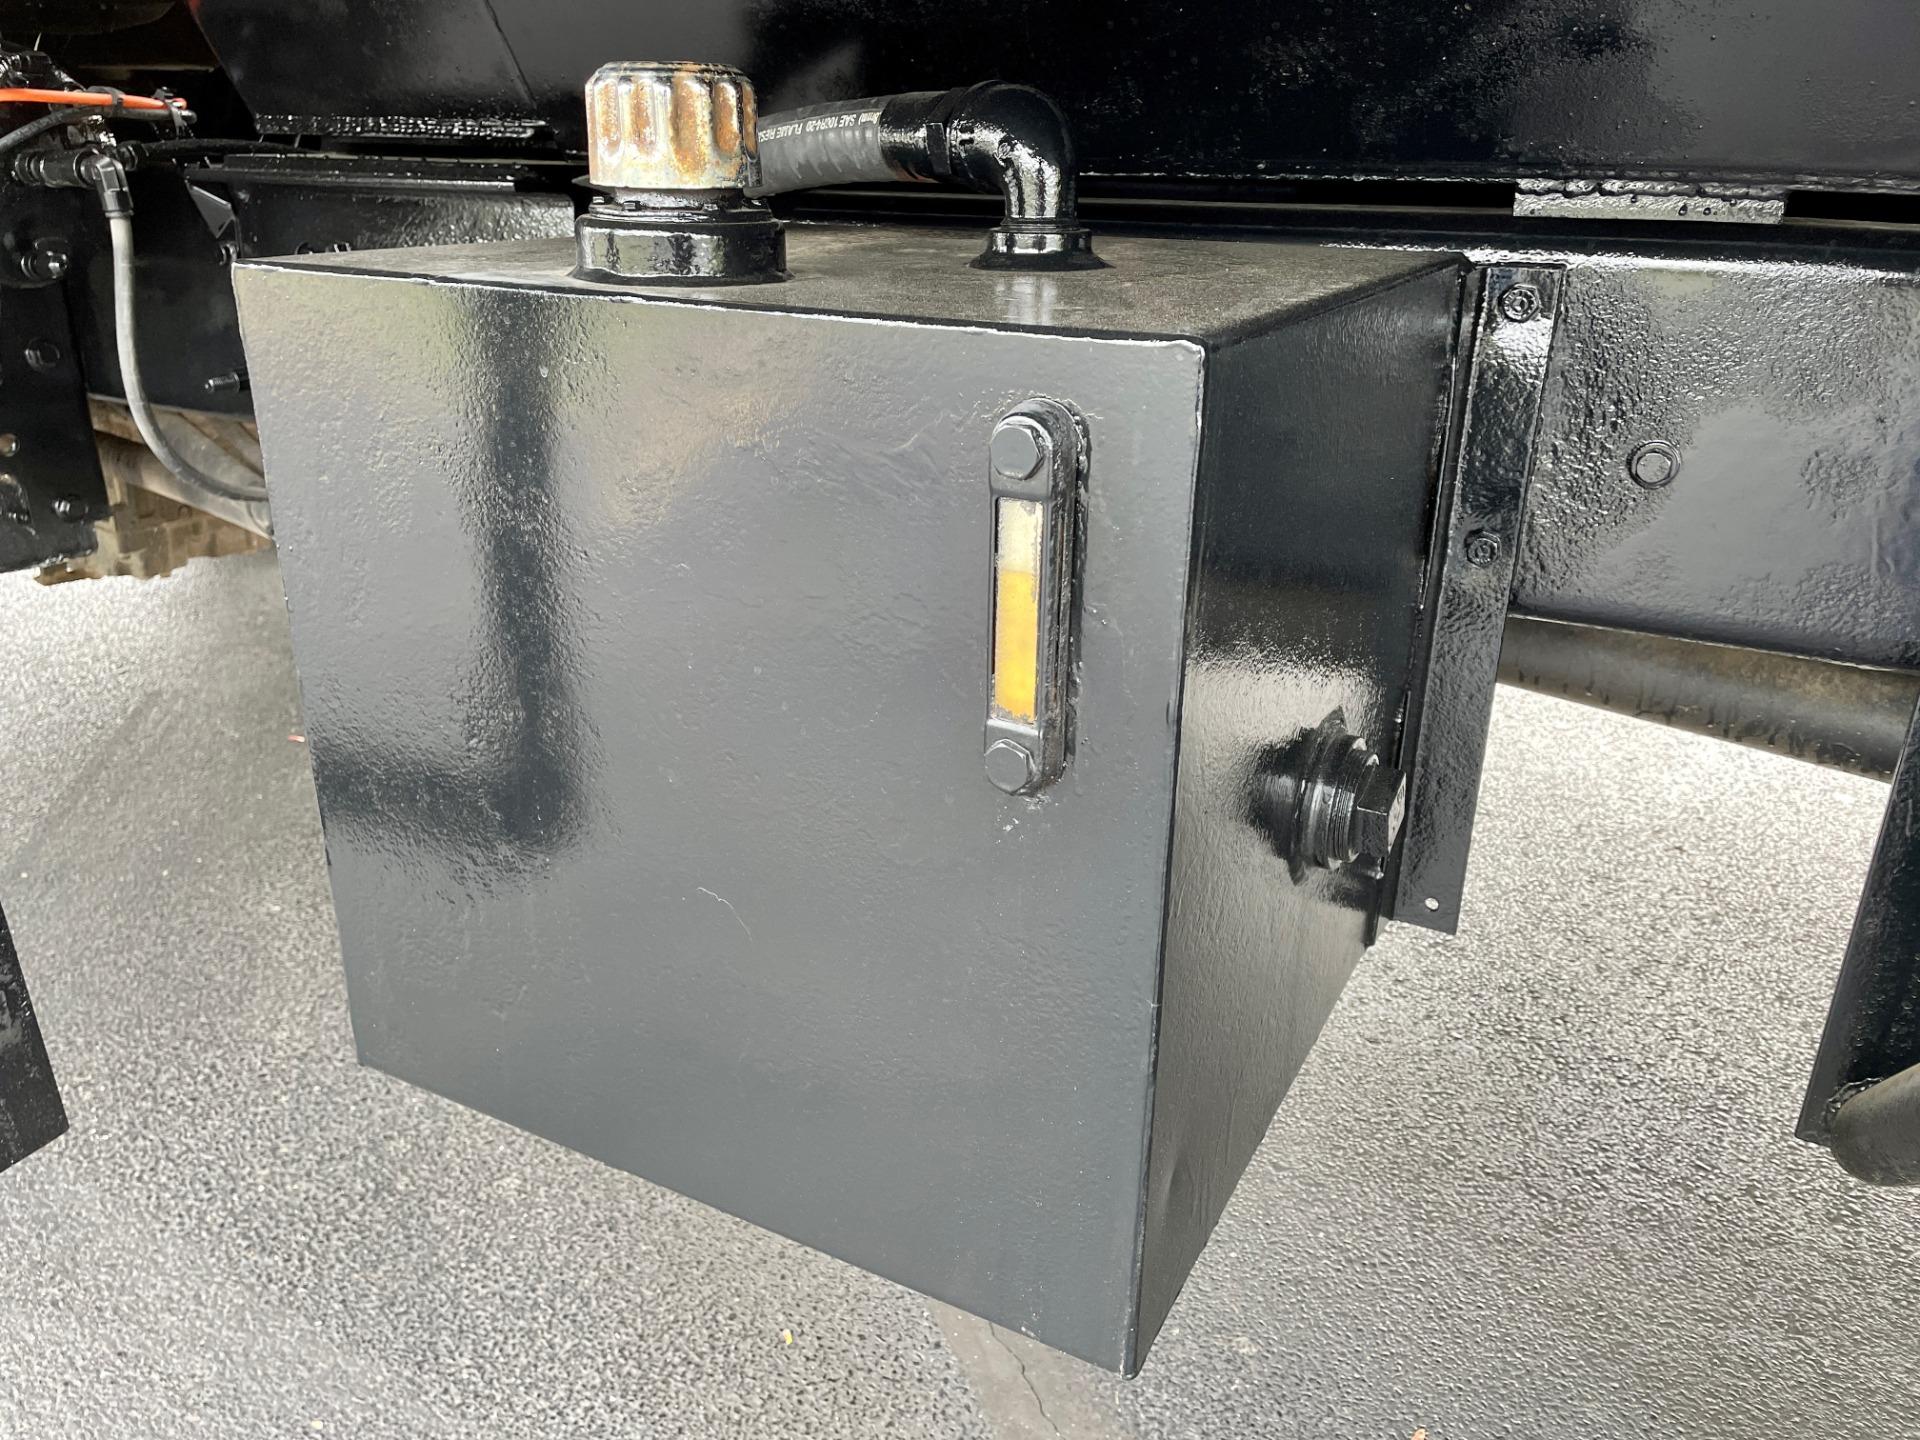 Used-2007-Ford-F750-Super-Duty-Dump-Truck---CAT-DIESEL---Automatic---SUPER-CLEAN